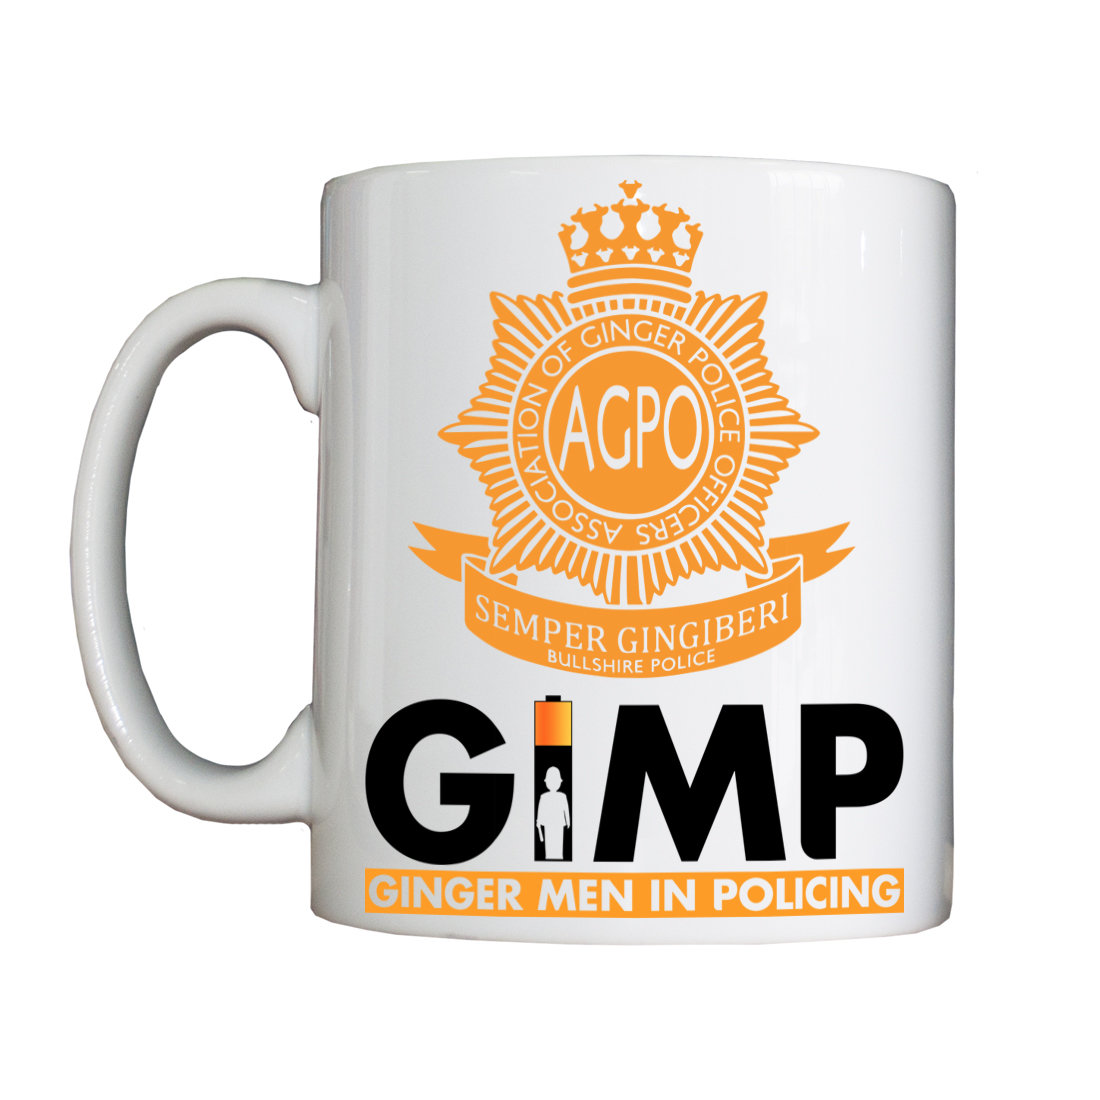 Personalised 'GIMP' Drinking Vessel